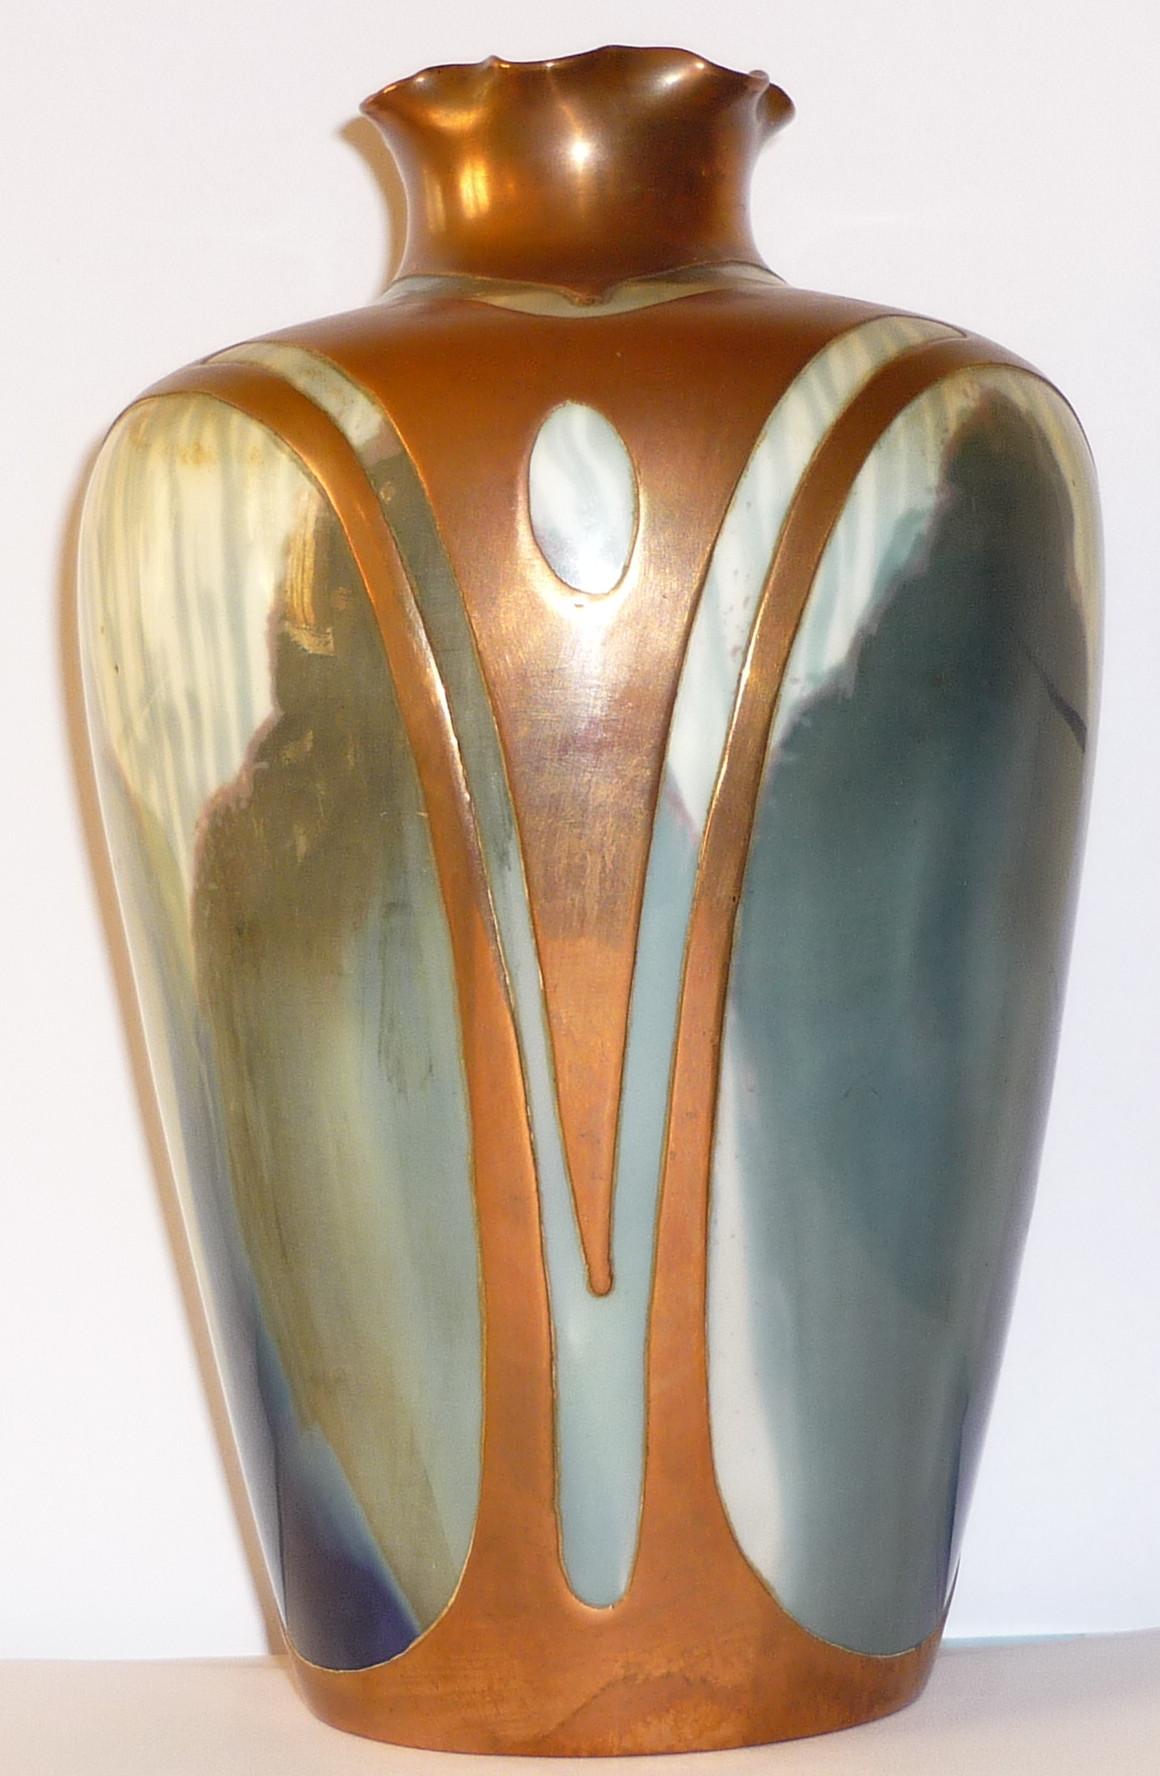 file vase rosenthal art nouveau vers 1900 h 18 cm jpg wikimedia commons. Black Bedroom Furniture Sets. Home Design Ideas